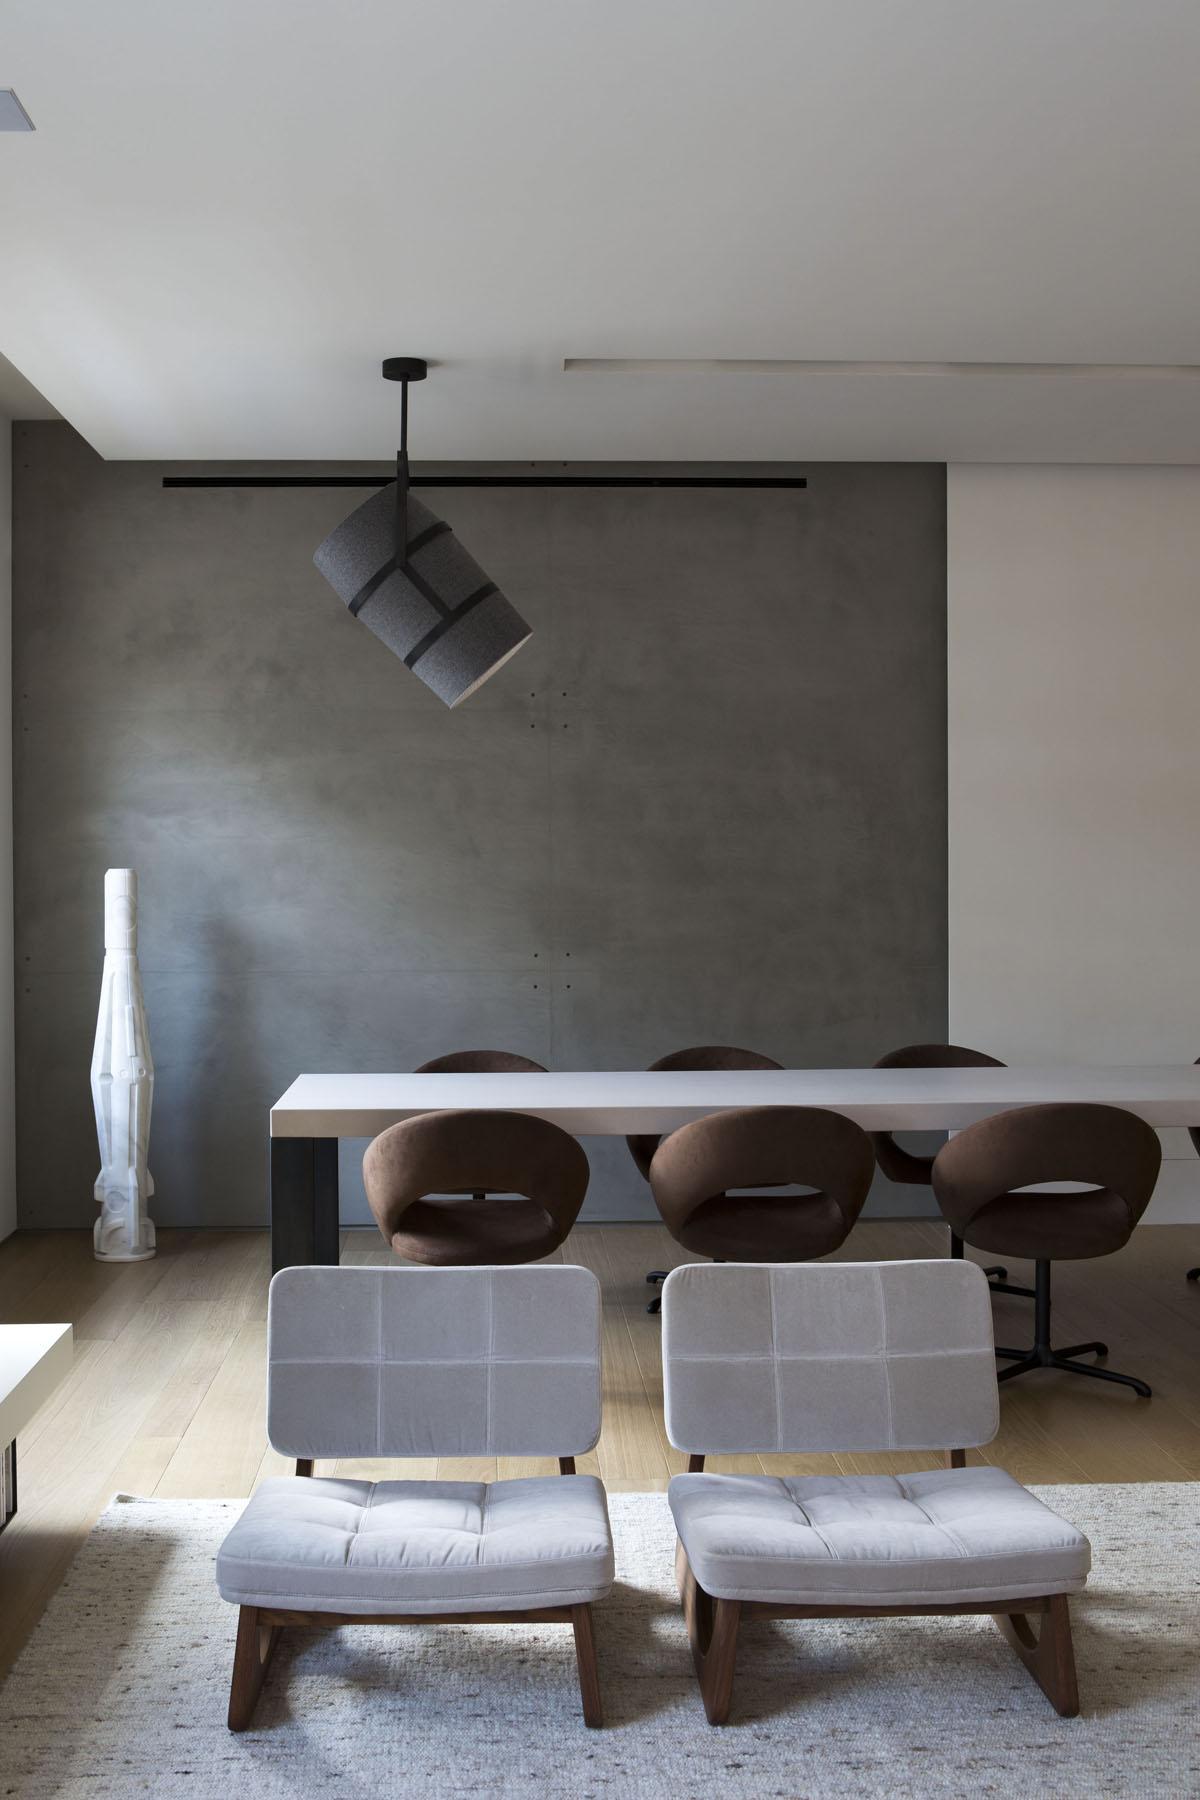 06 bonucci Sleek Modern by Fabio Fantolino